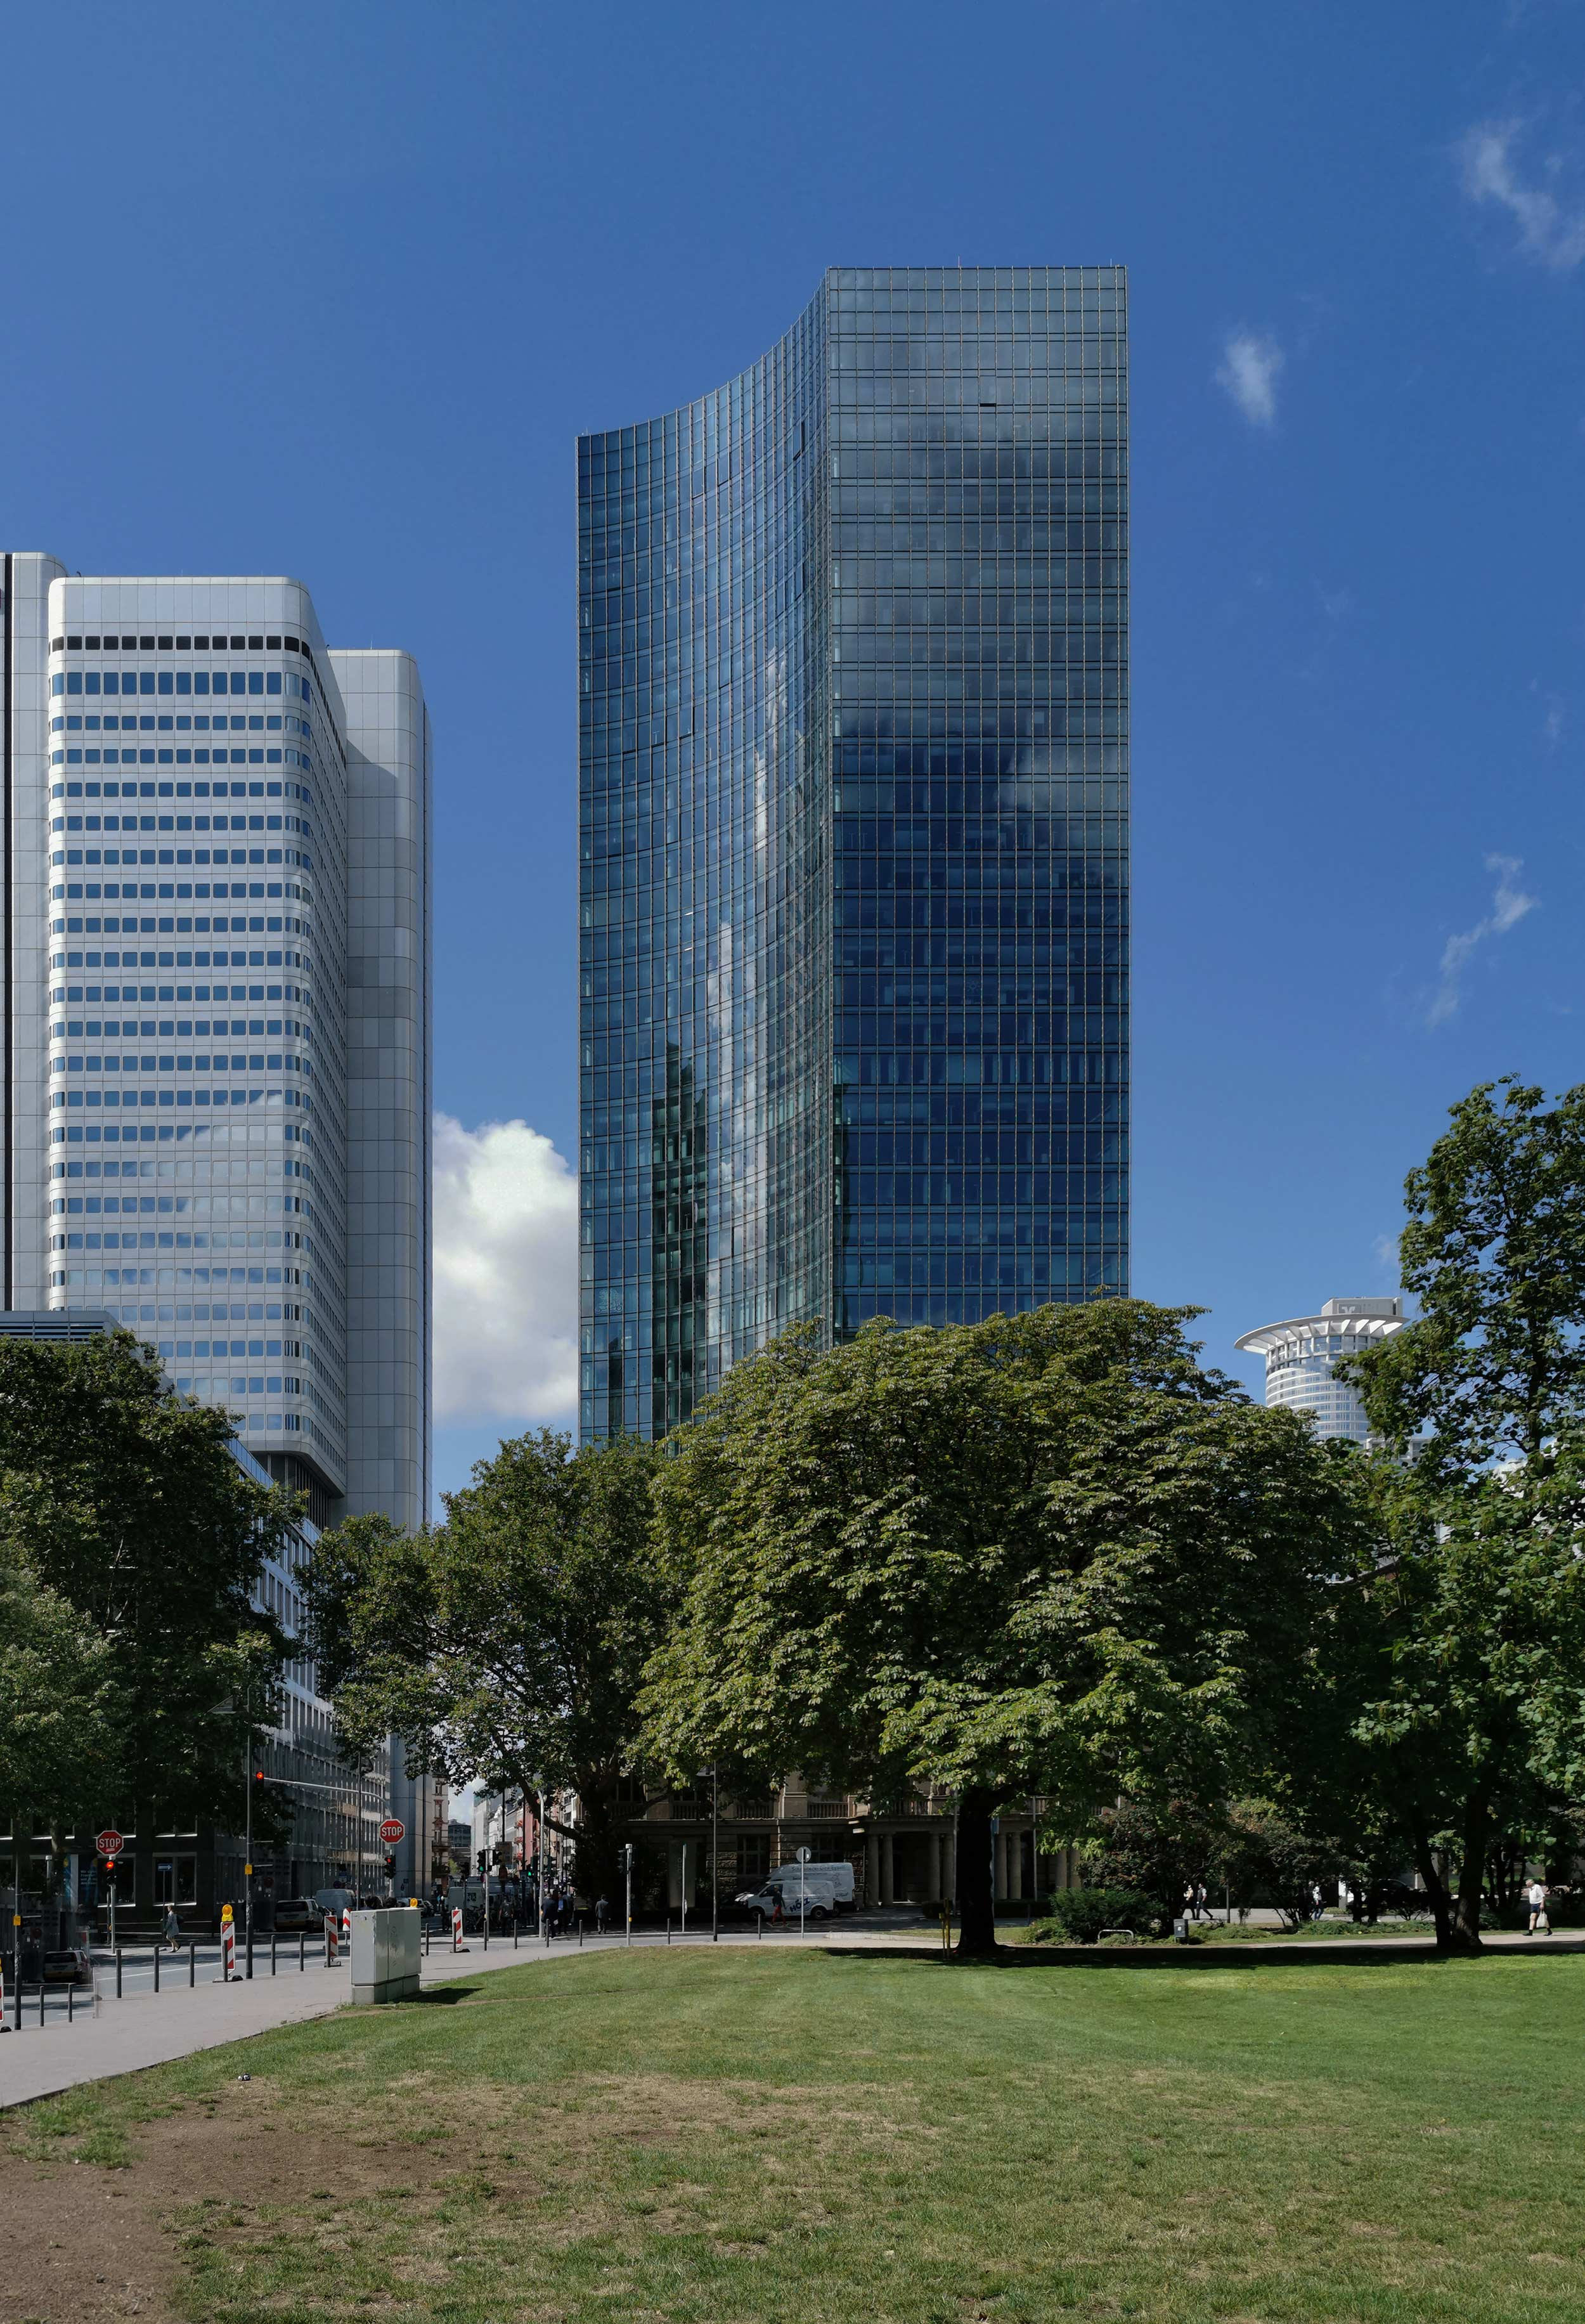 SKYPER high-rise in Frankfurt - High resolution photo - High-quality image - Modern glass high-rise - SKYPER Tower